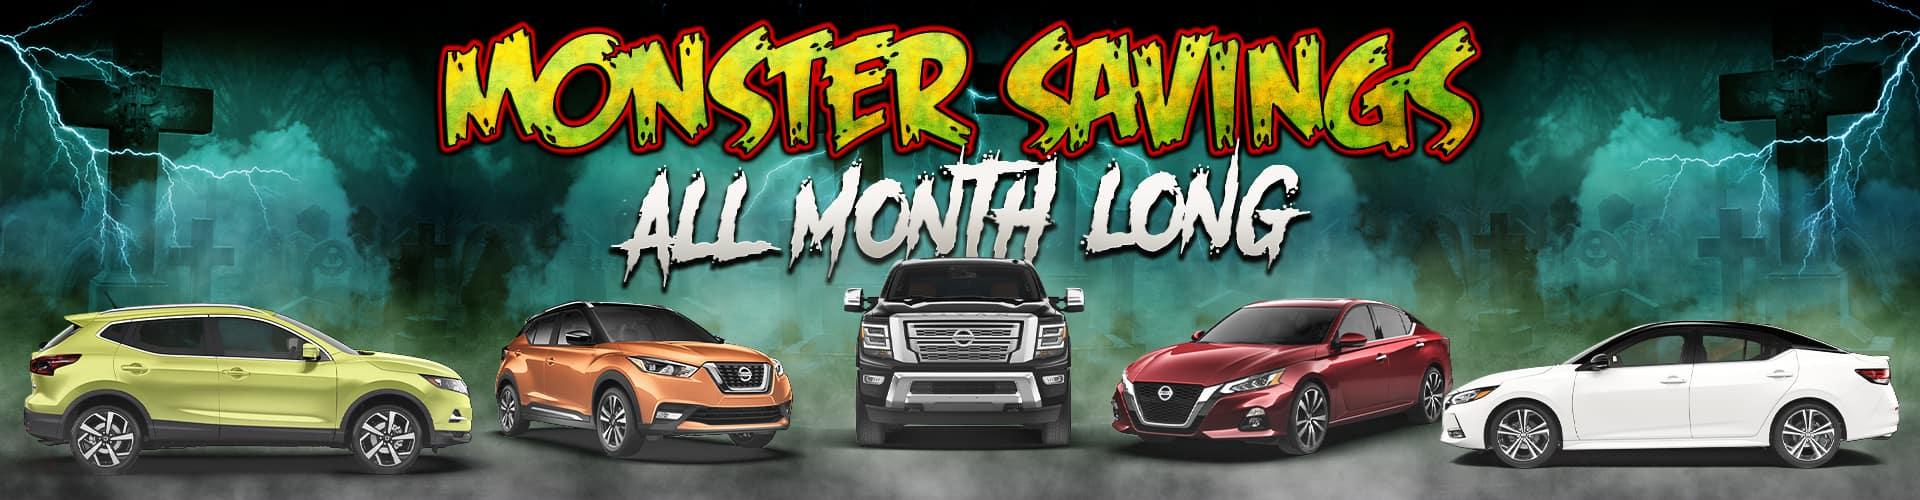 Monster-Savings Homepage Banner